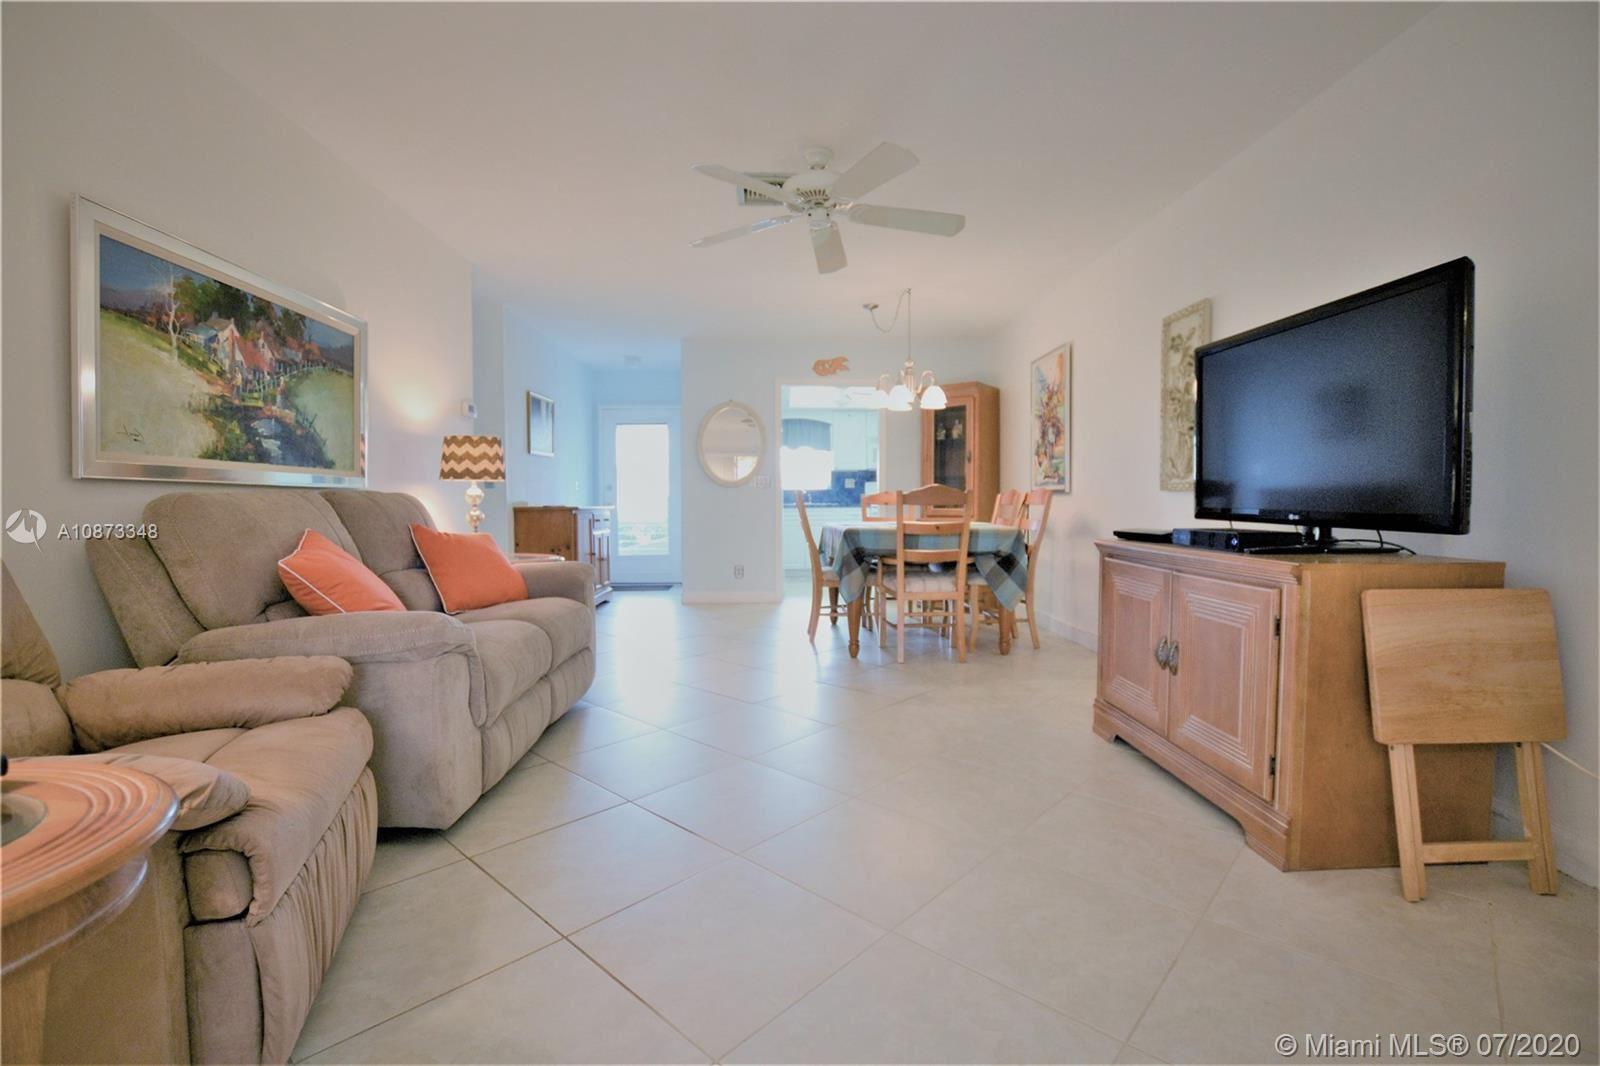 2835 Crosley Dr E #C, West Palm Beach, FL 33415 - #: A10873348